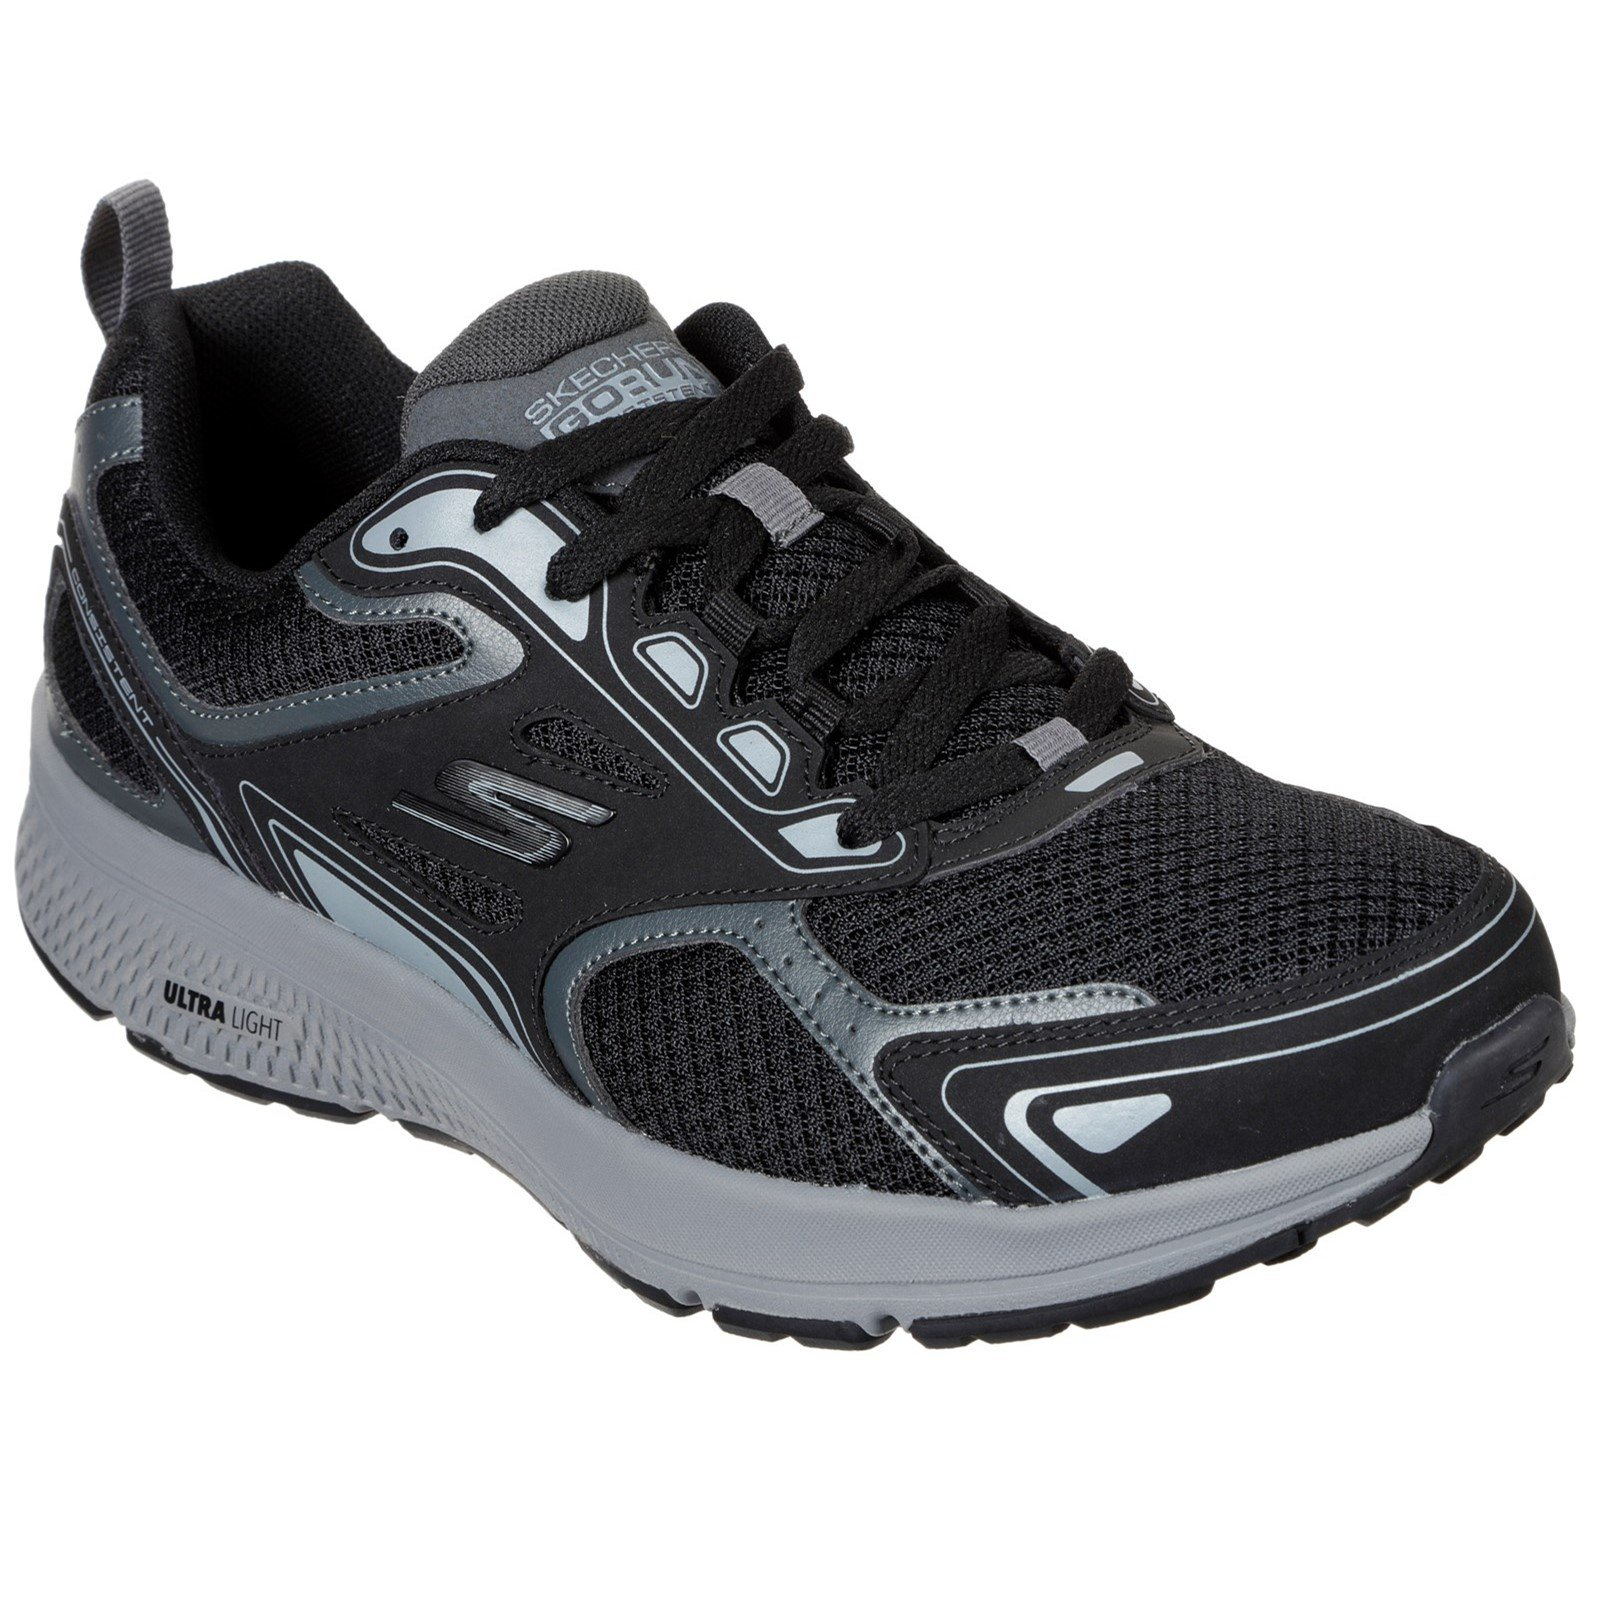 Skechers Men's Go Run Consistent Wide Trainer Multicolor 33072 - Black/Grey 8